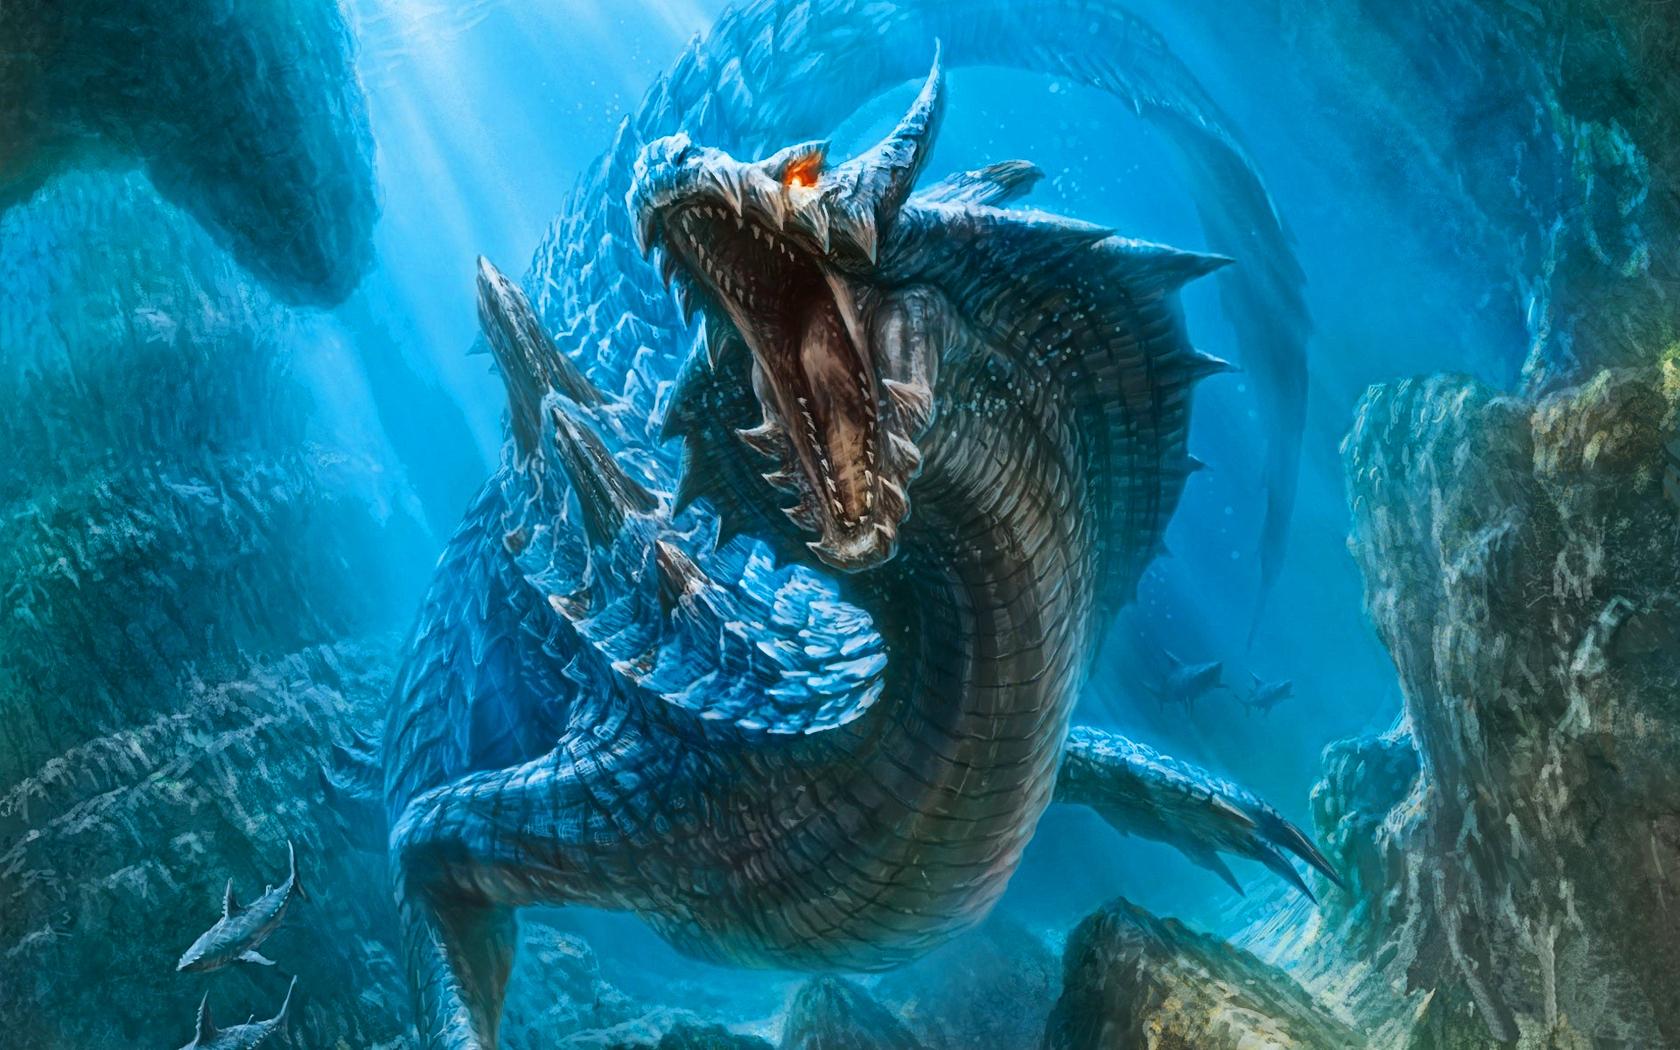 Water-dragon-wallpaper